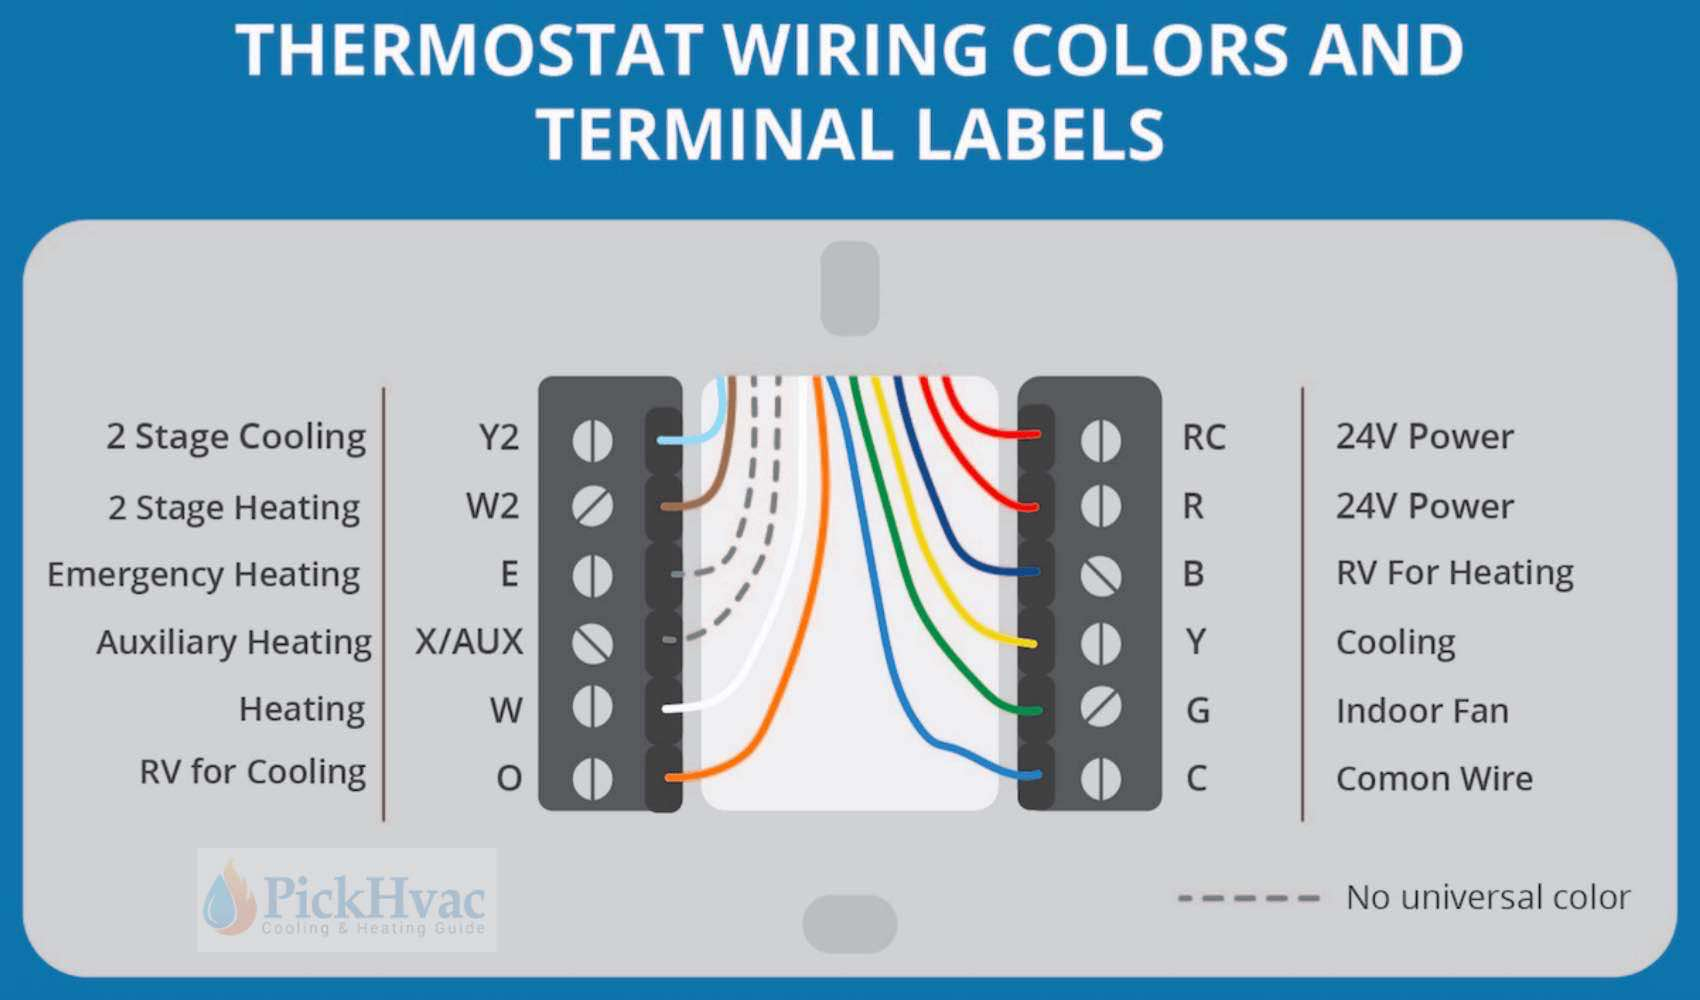 Goodman Heat Pump Thermostat Wiring Diagram To Honeywell 5000 8 Wire - Goodman Heat Pump Thermostat Wiring Diagram